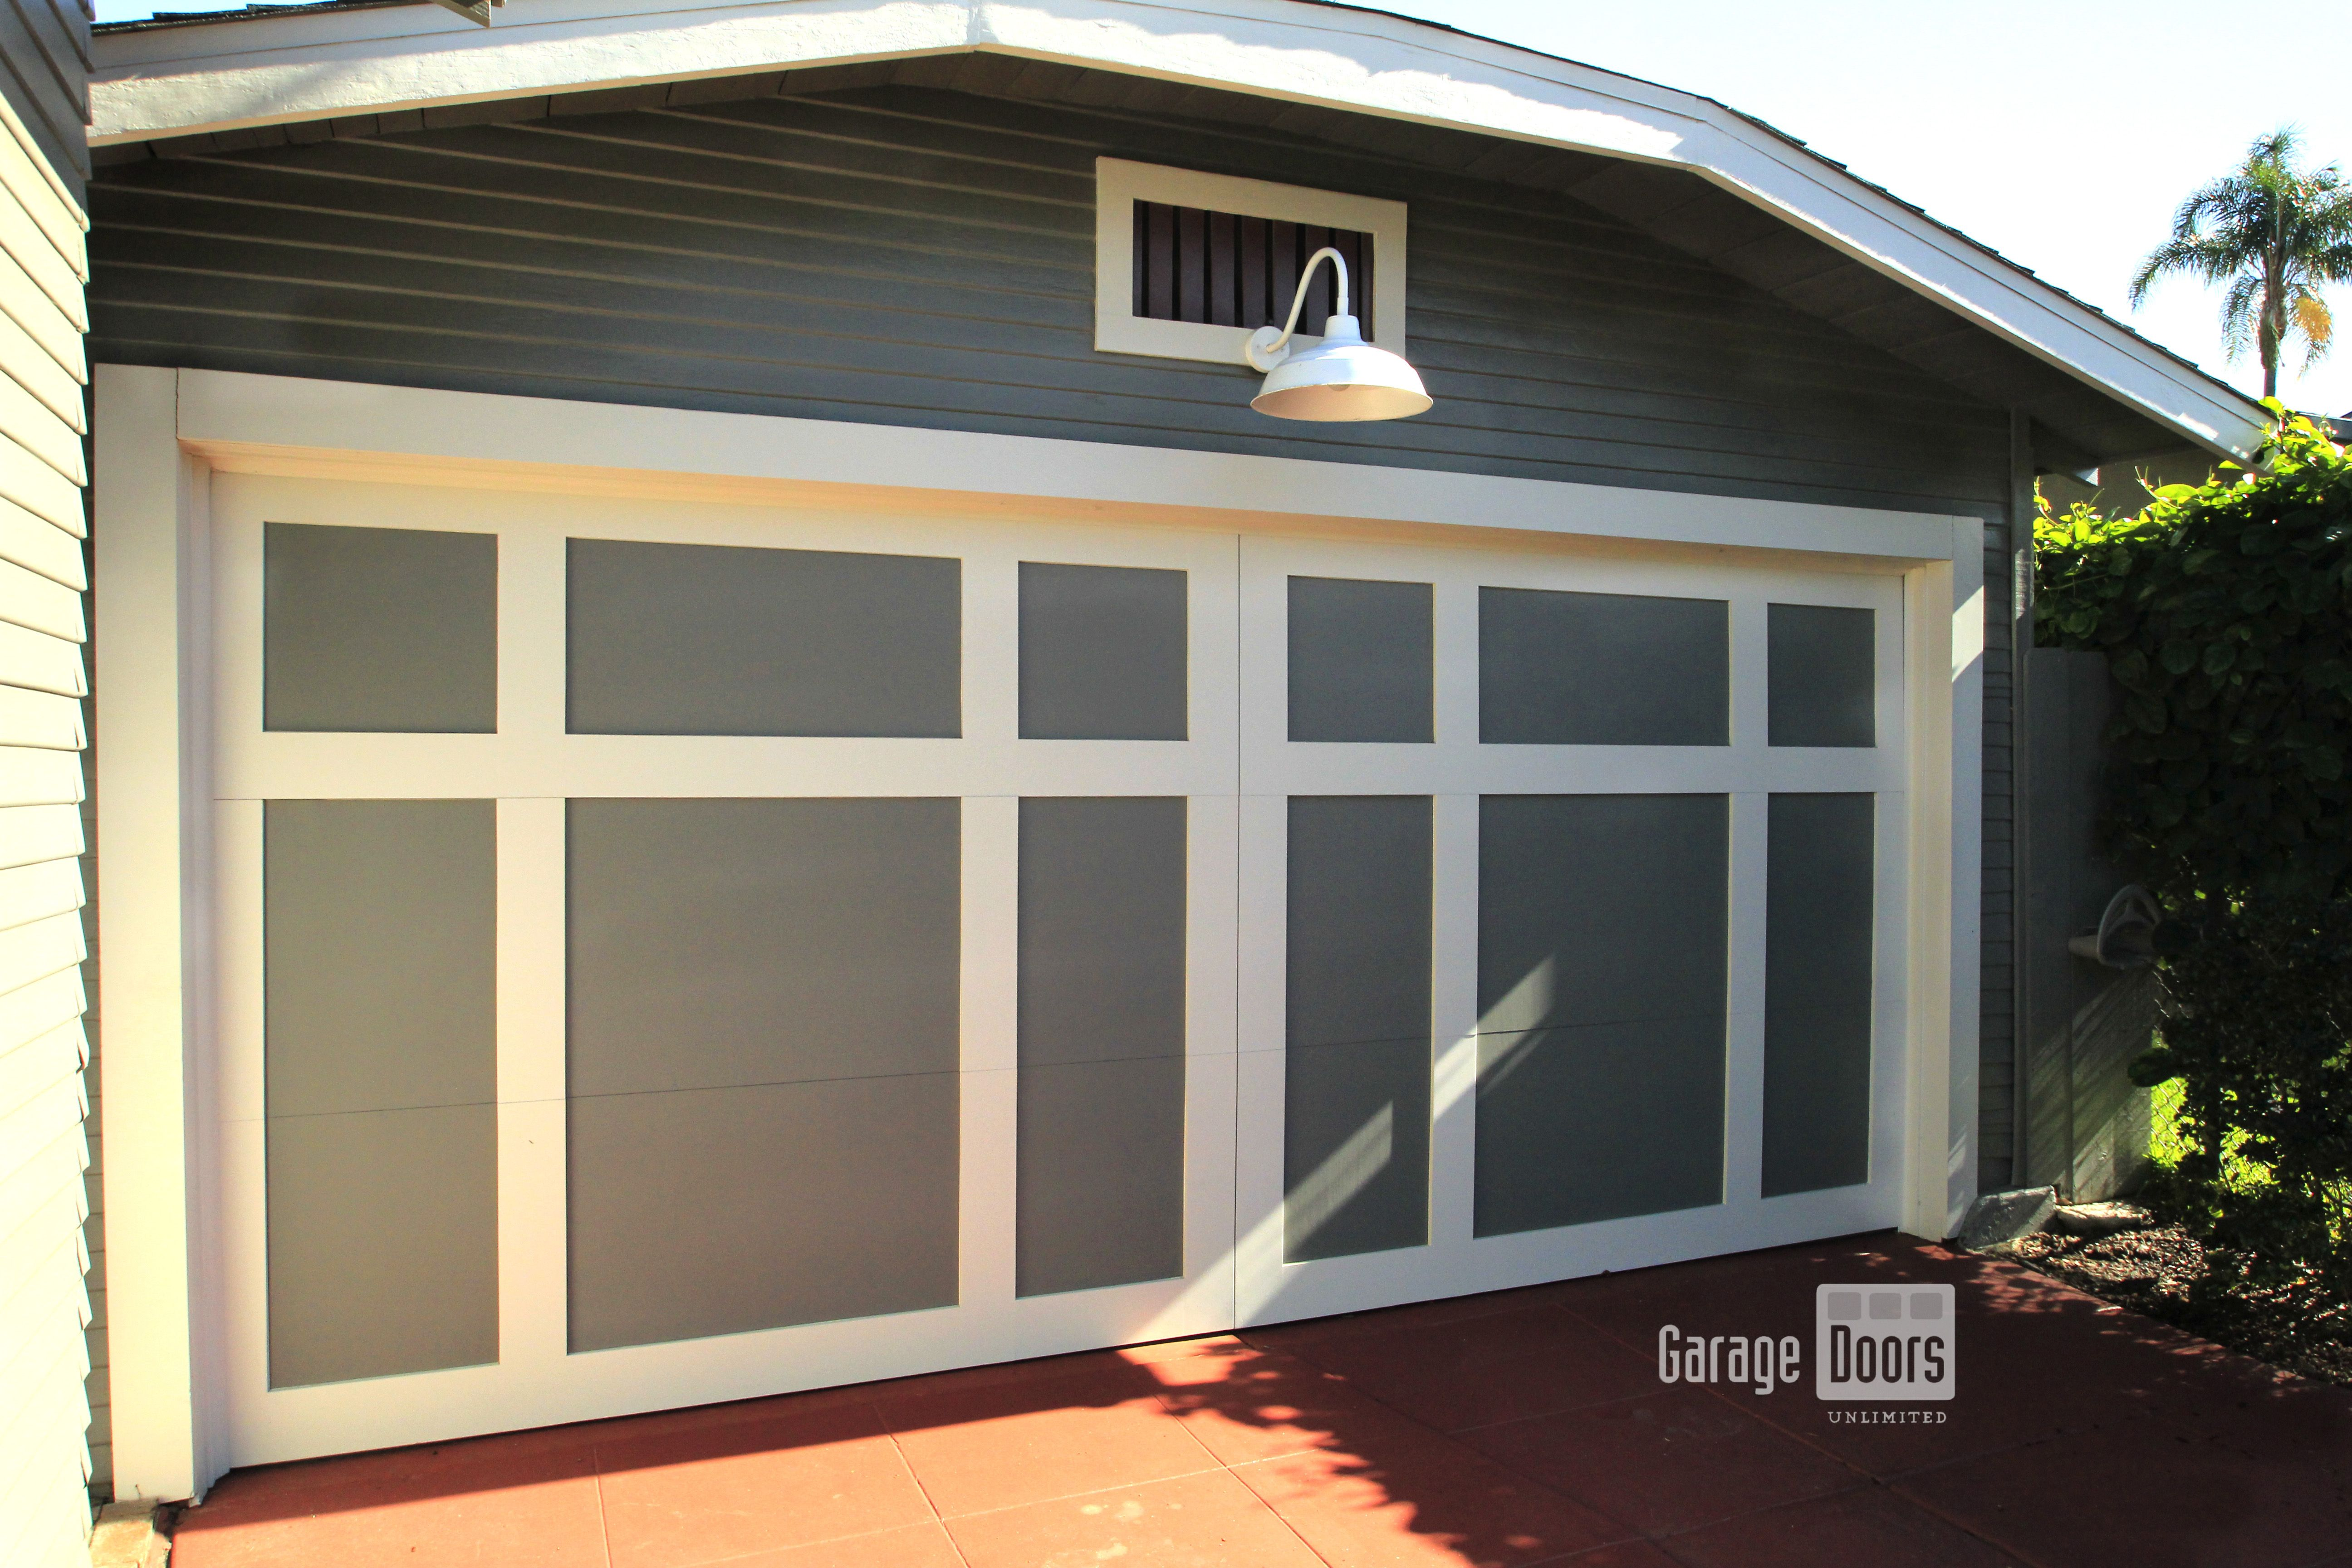 Barn Style Garage Doors With White Trimming San Diego Ca Garage